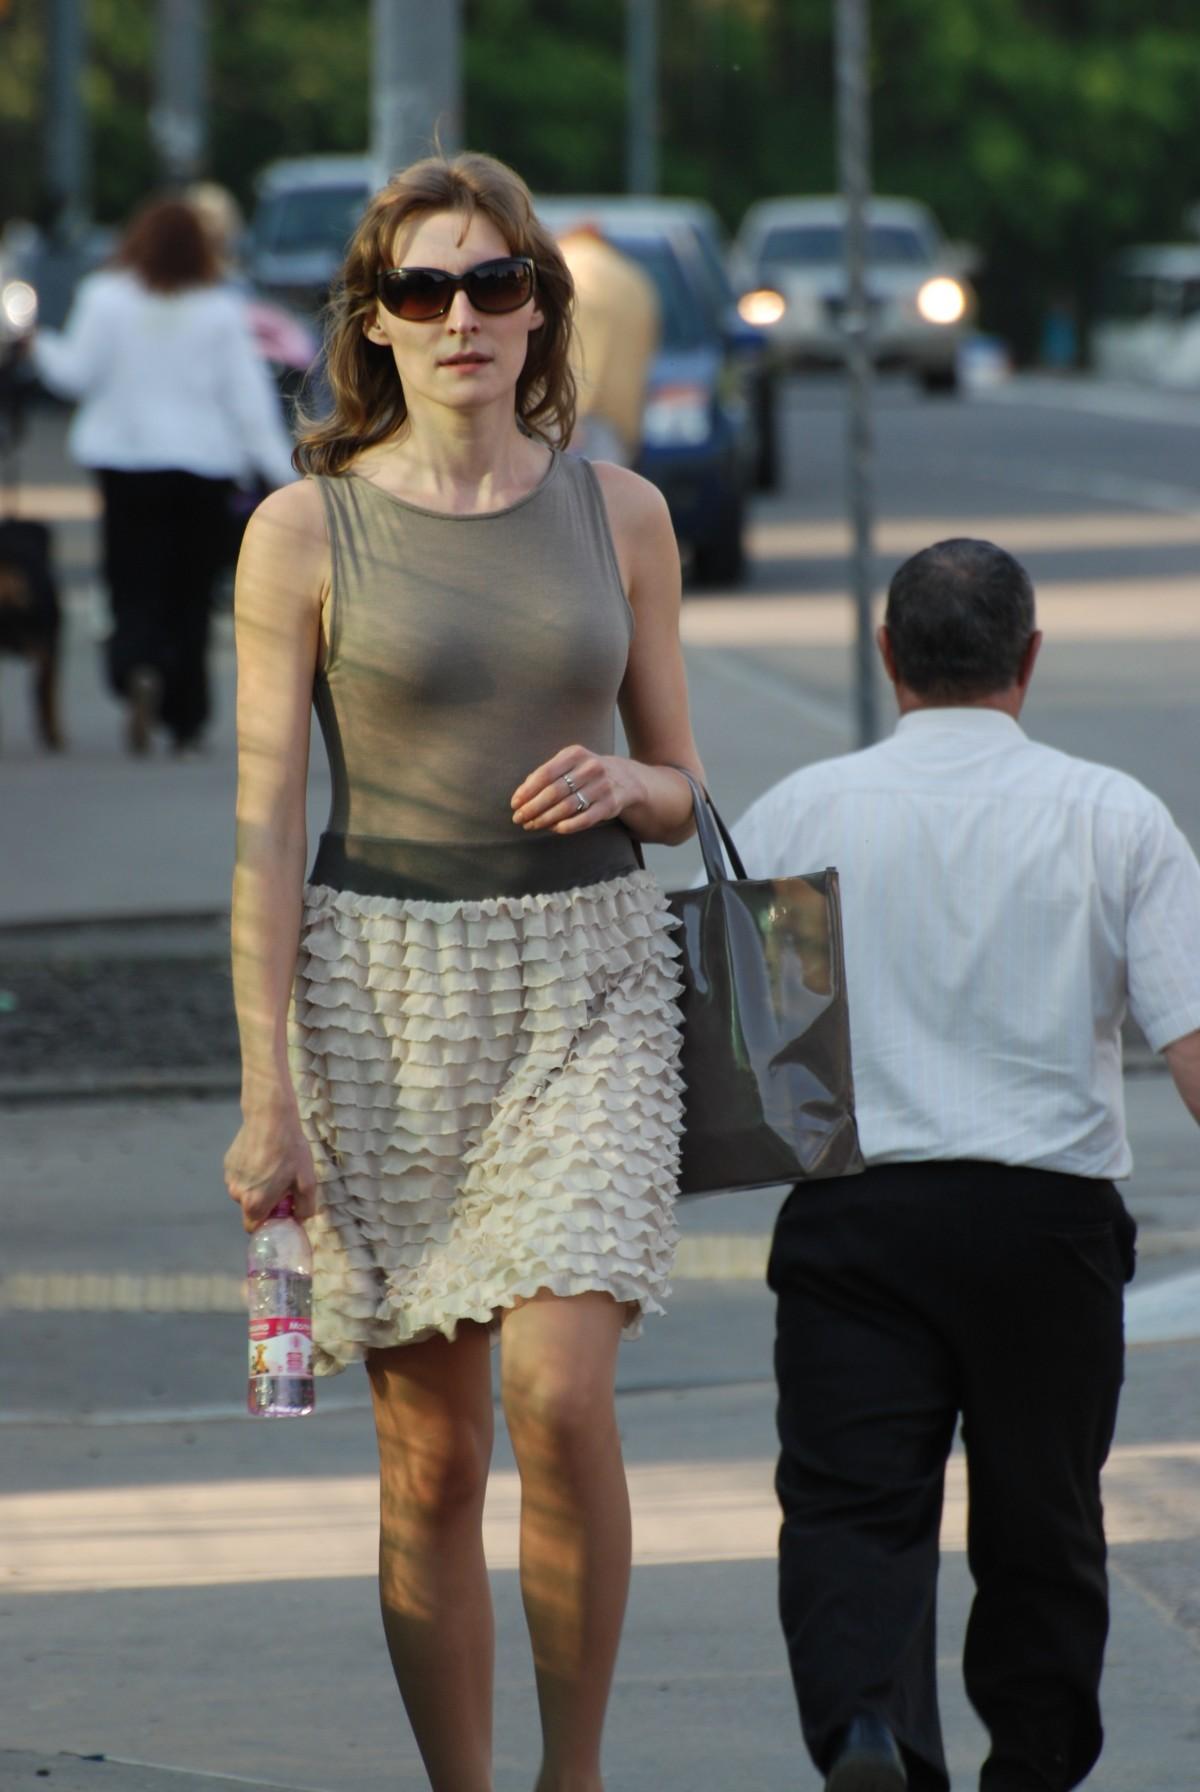 Free Images : People, Girl, Woman, Road, Street, City, Leg